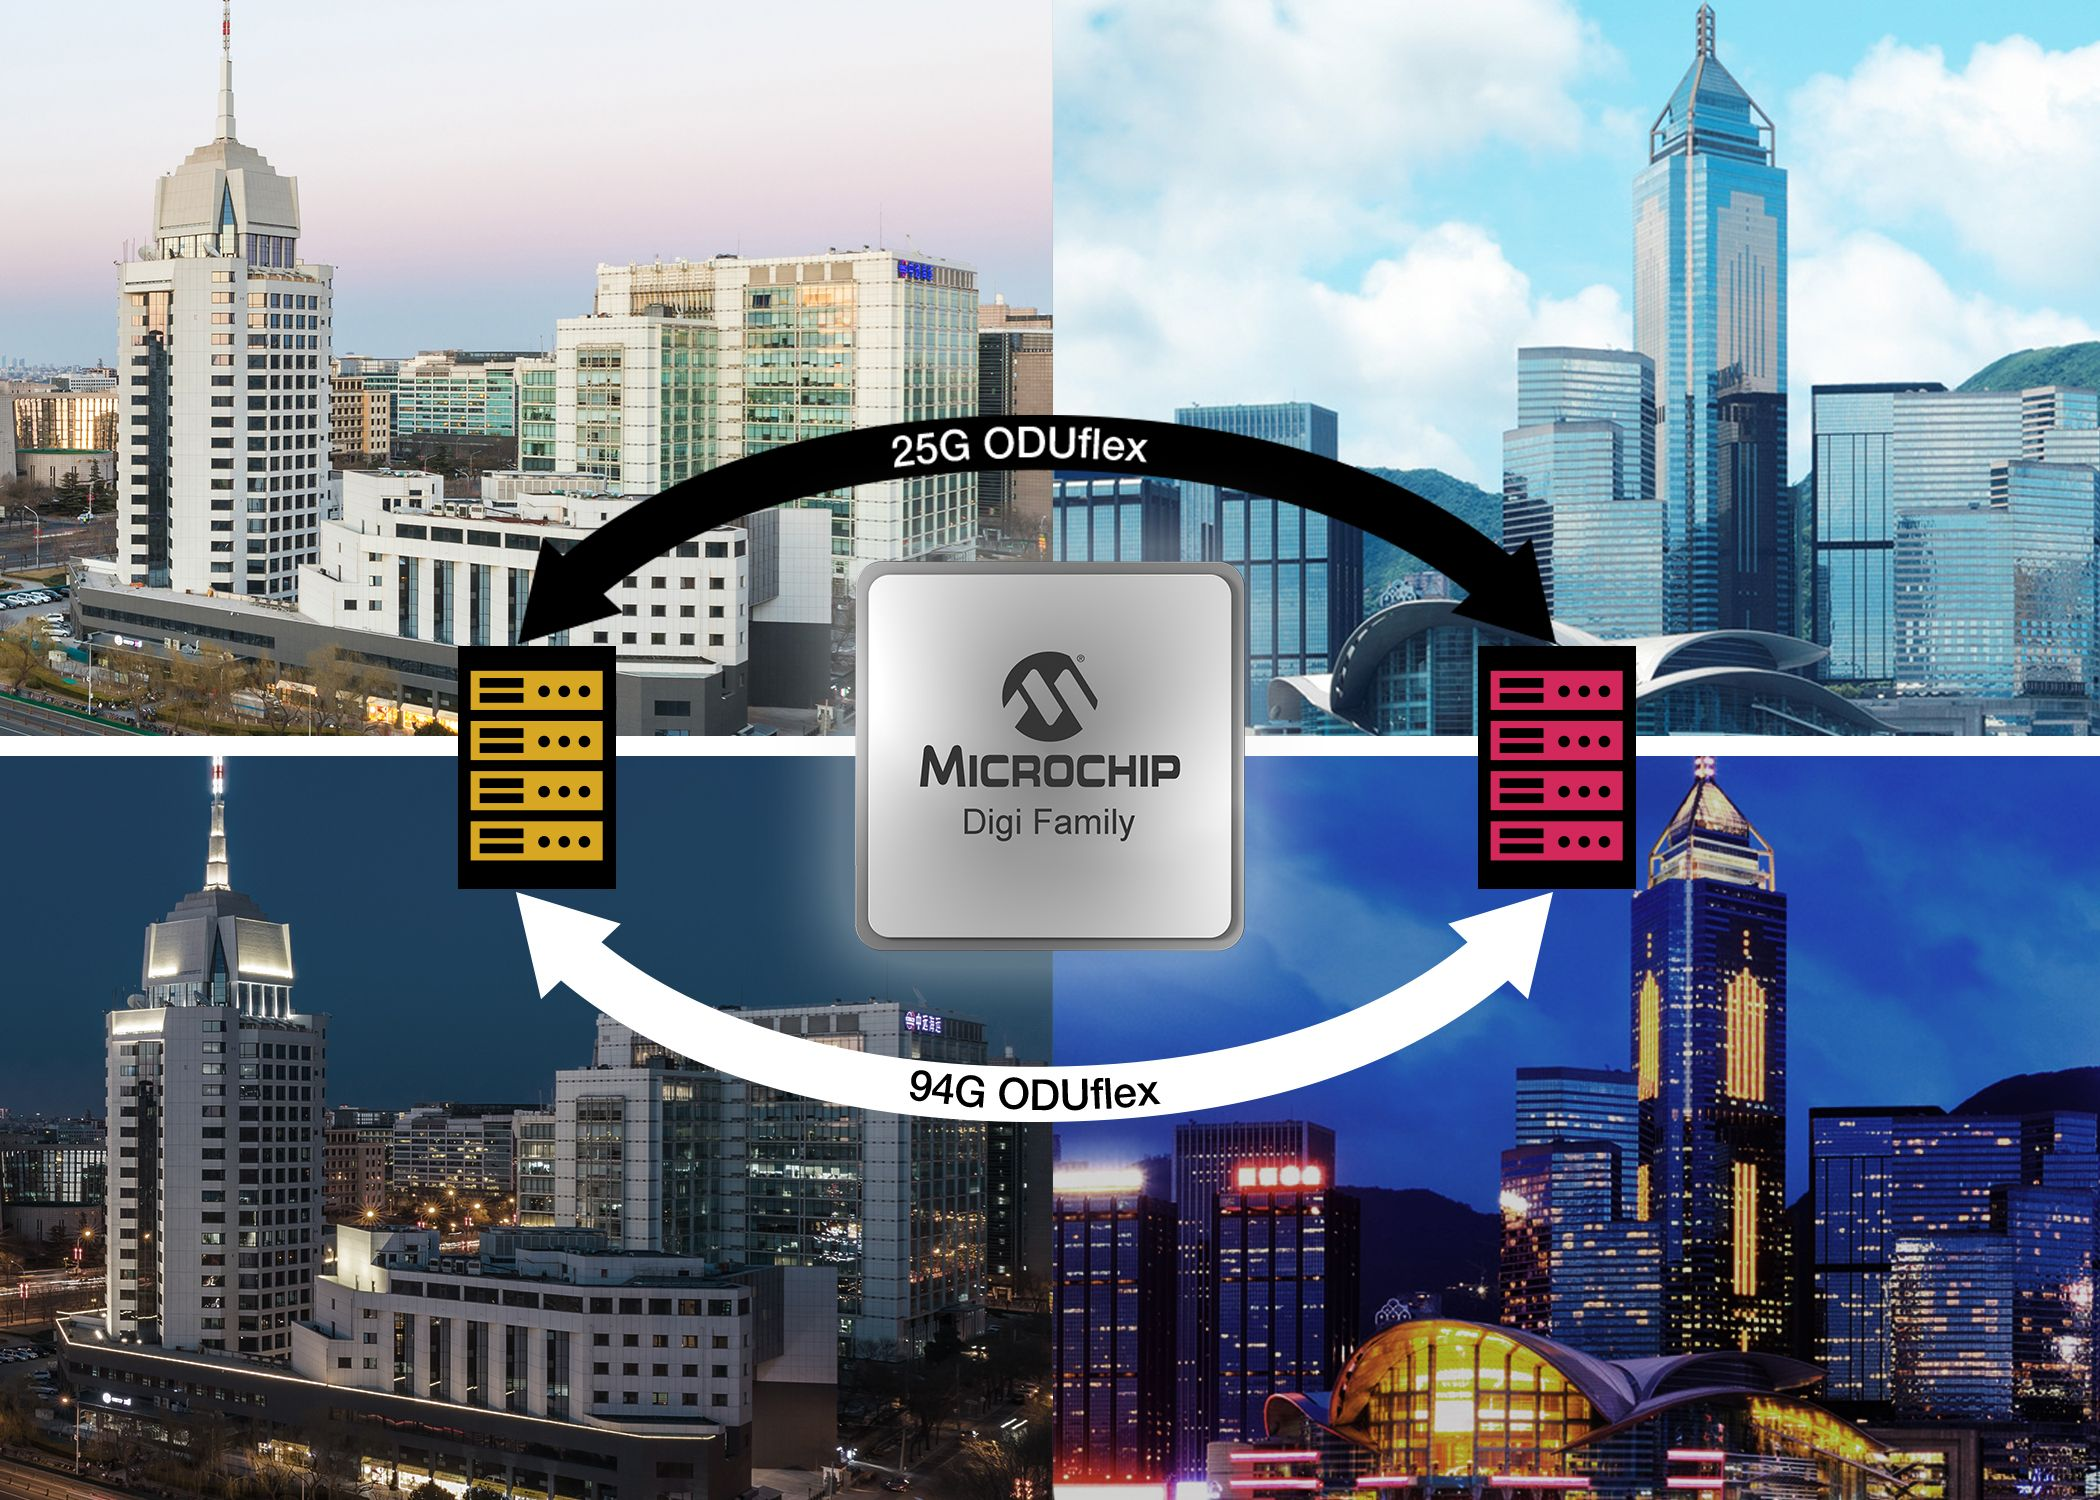 Microchip 助力中国部署全球首个由光传送网(OTN)支持的按需分配带宽服务